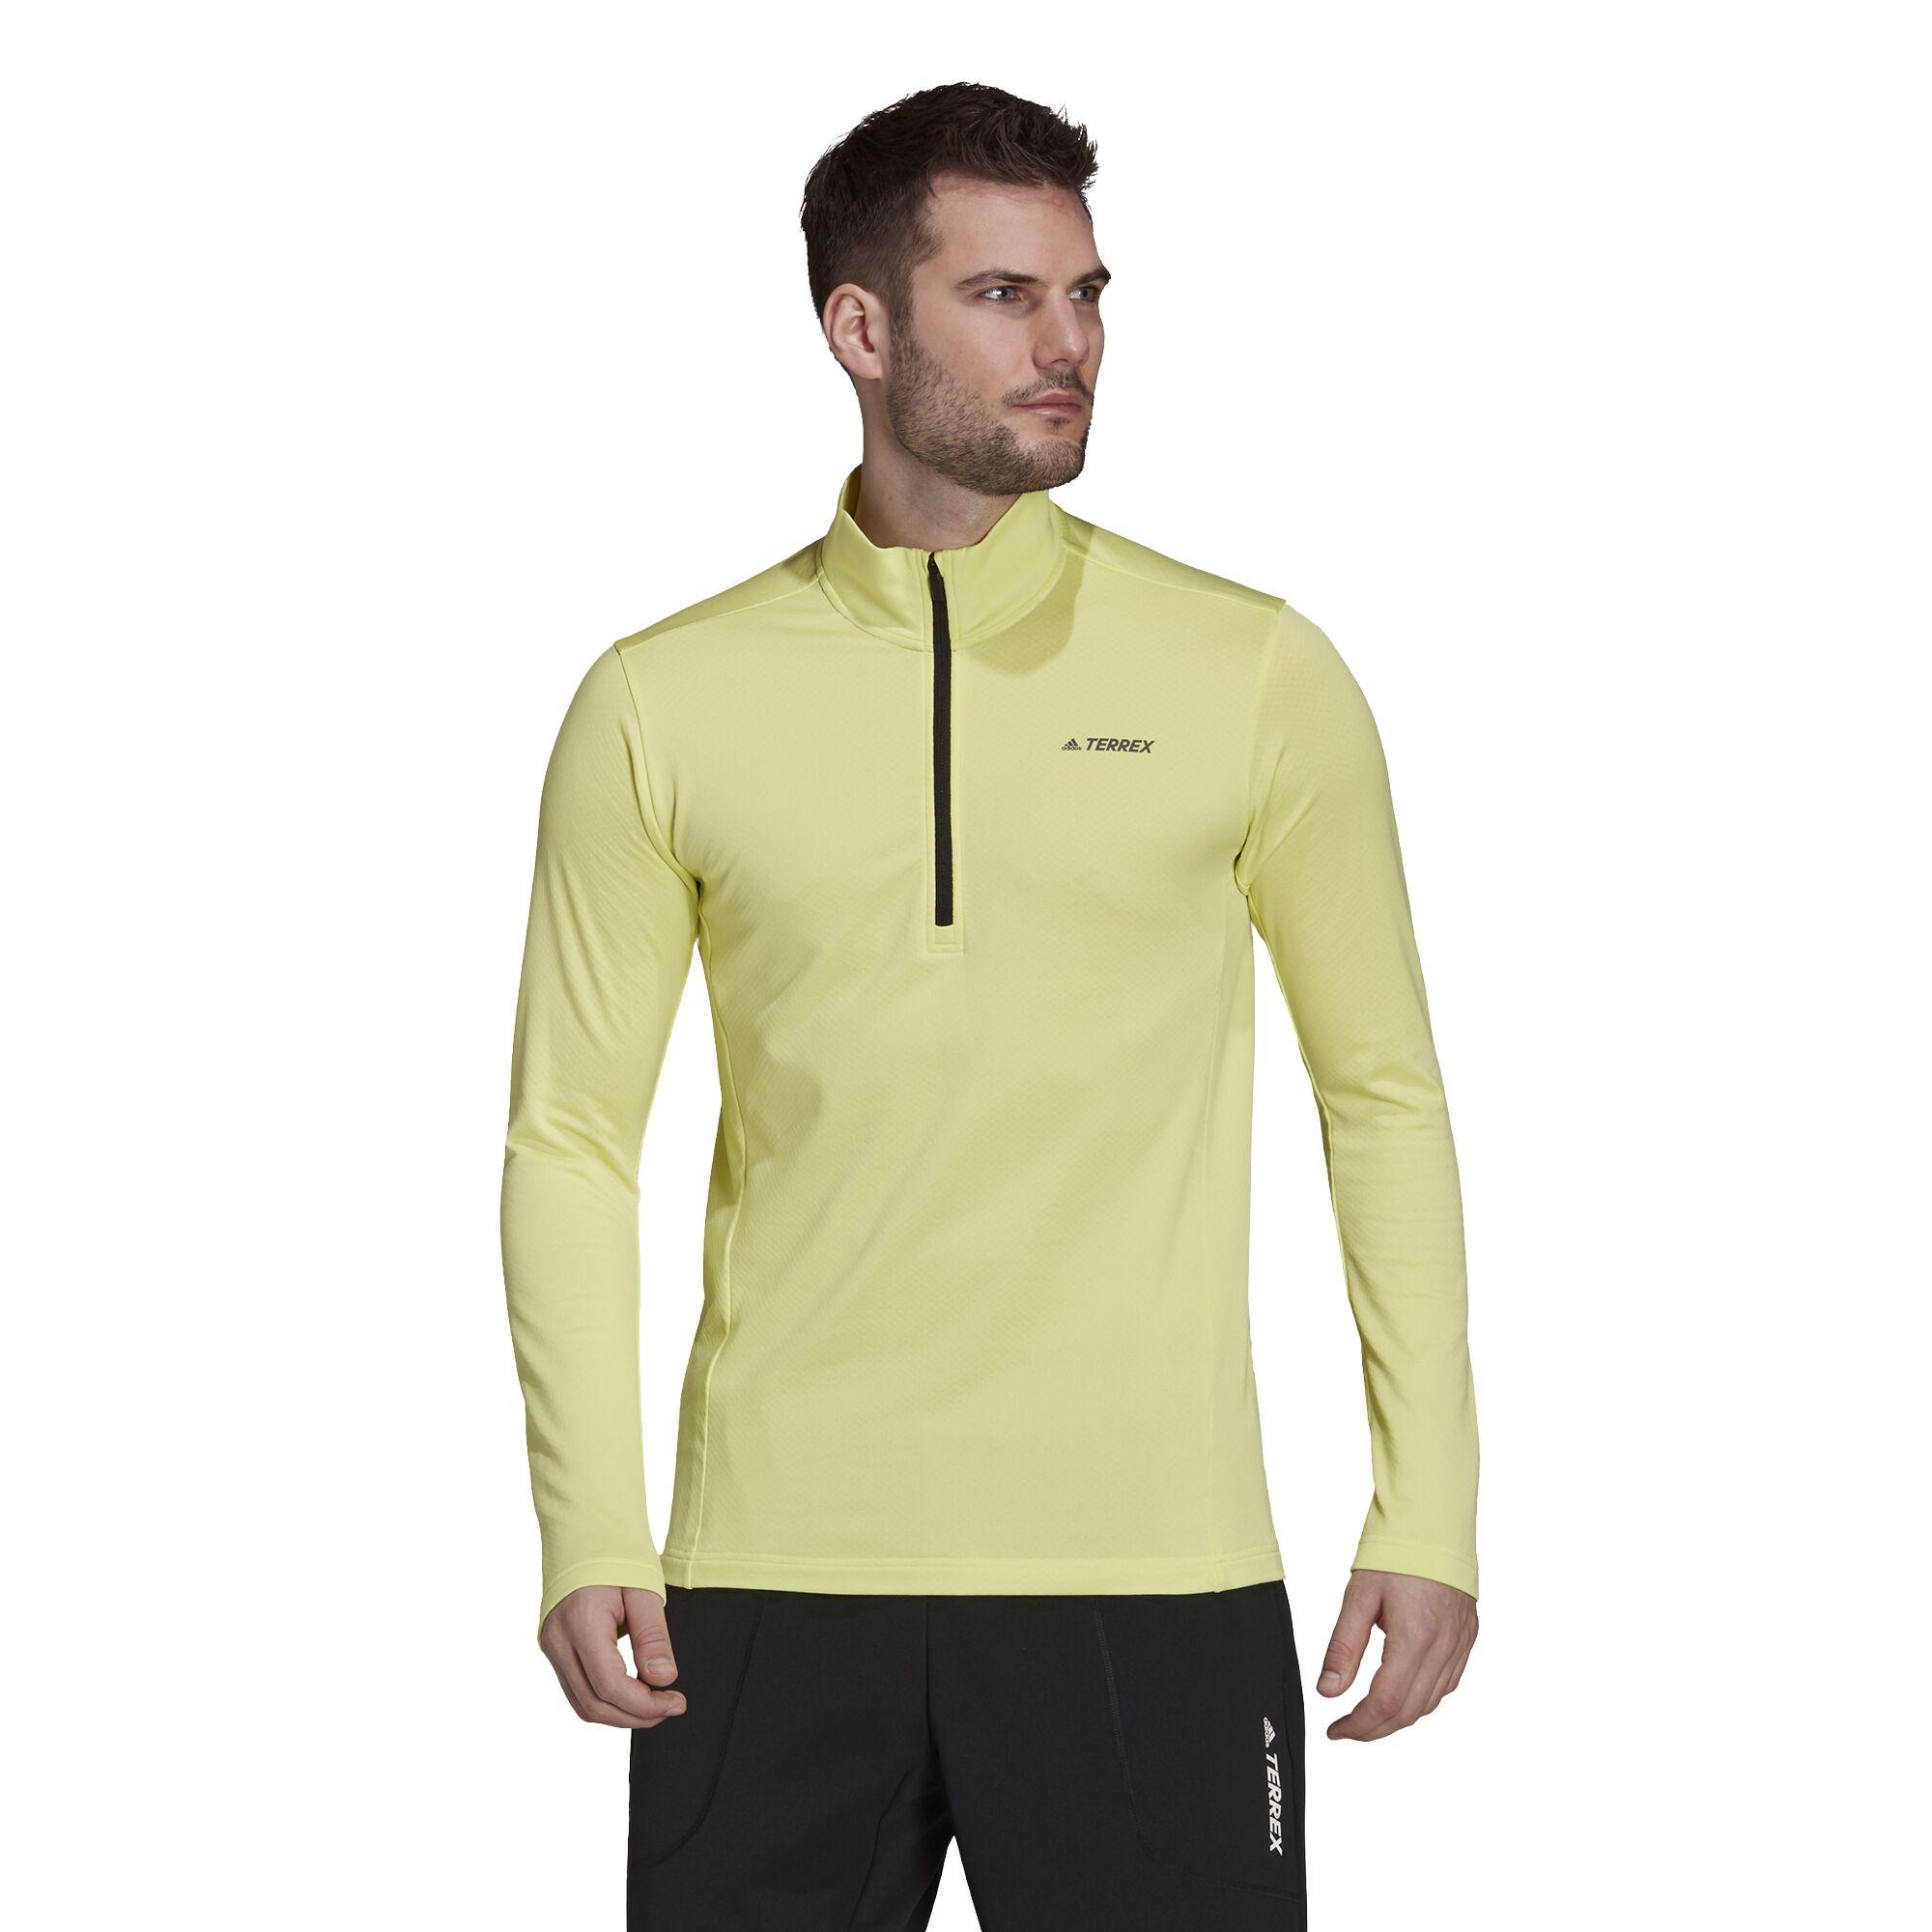 adidas Multi 1/2 Zip Fleece Top (Pulse Yellow)